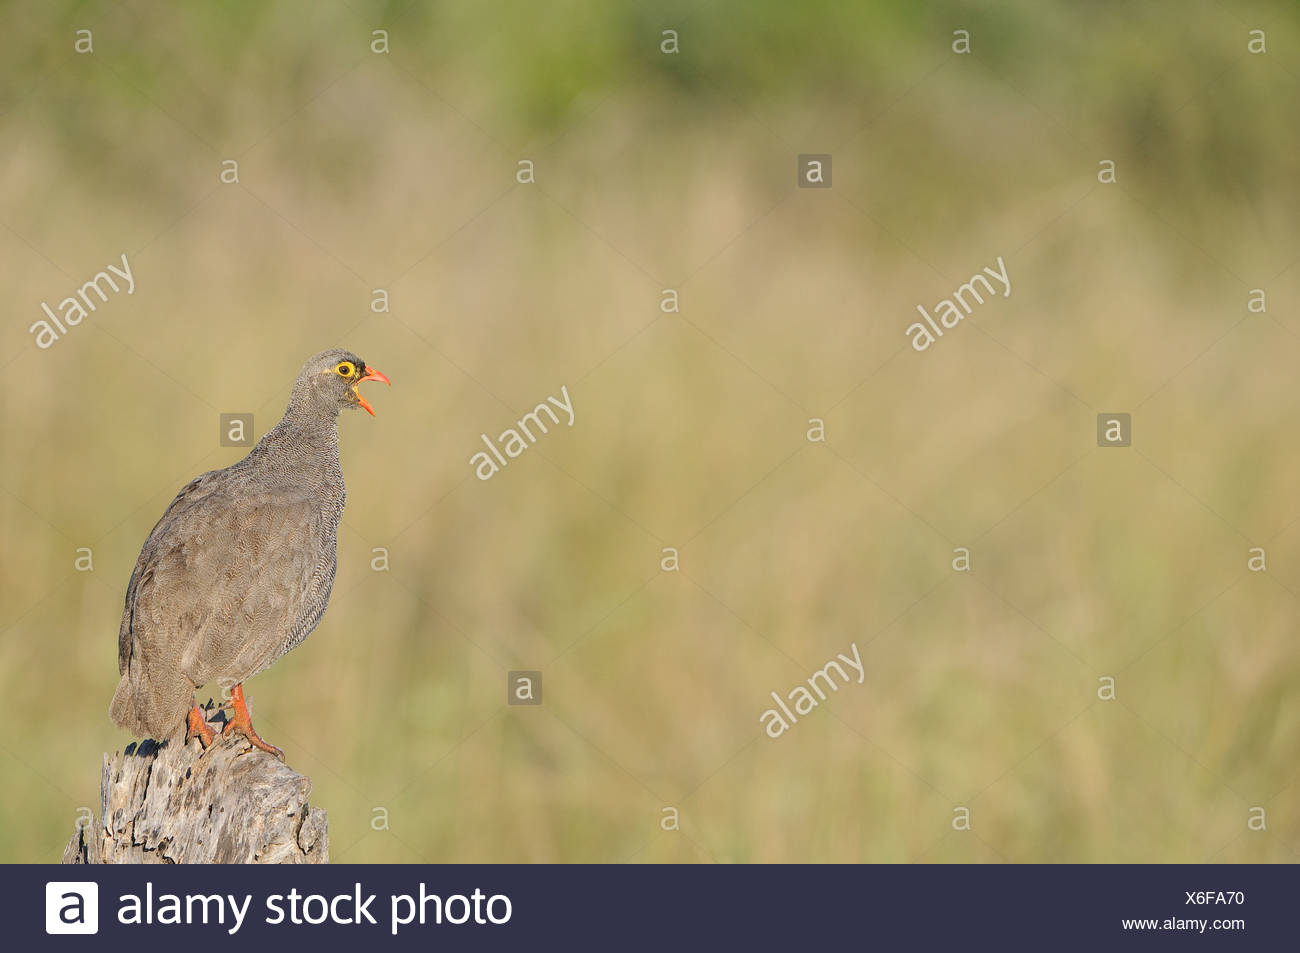 Partridge (Phasianidae) calling, Mapungubwe Game Reserve, Limpopo Province, South Africa Stock Photo